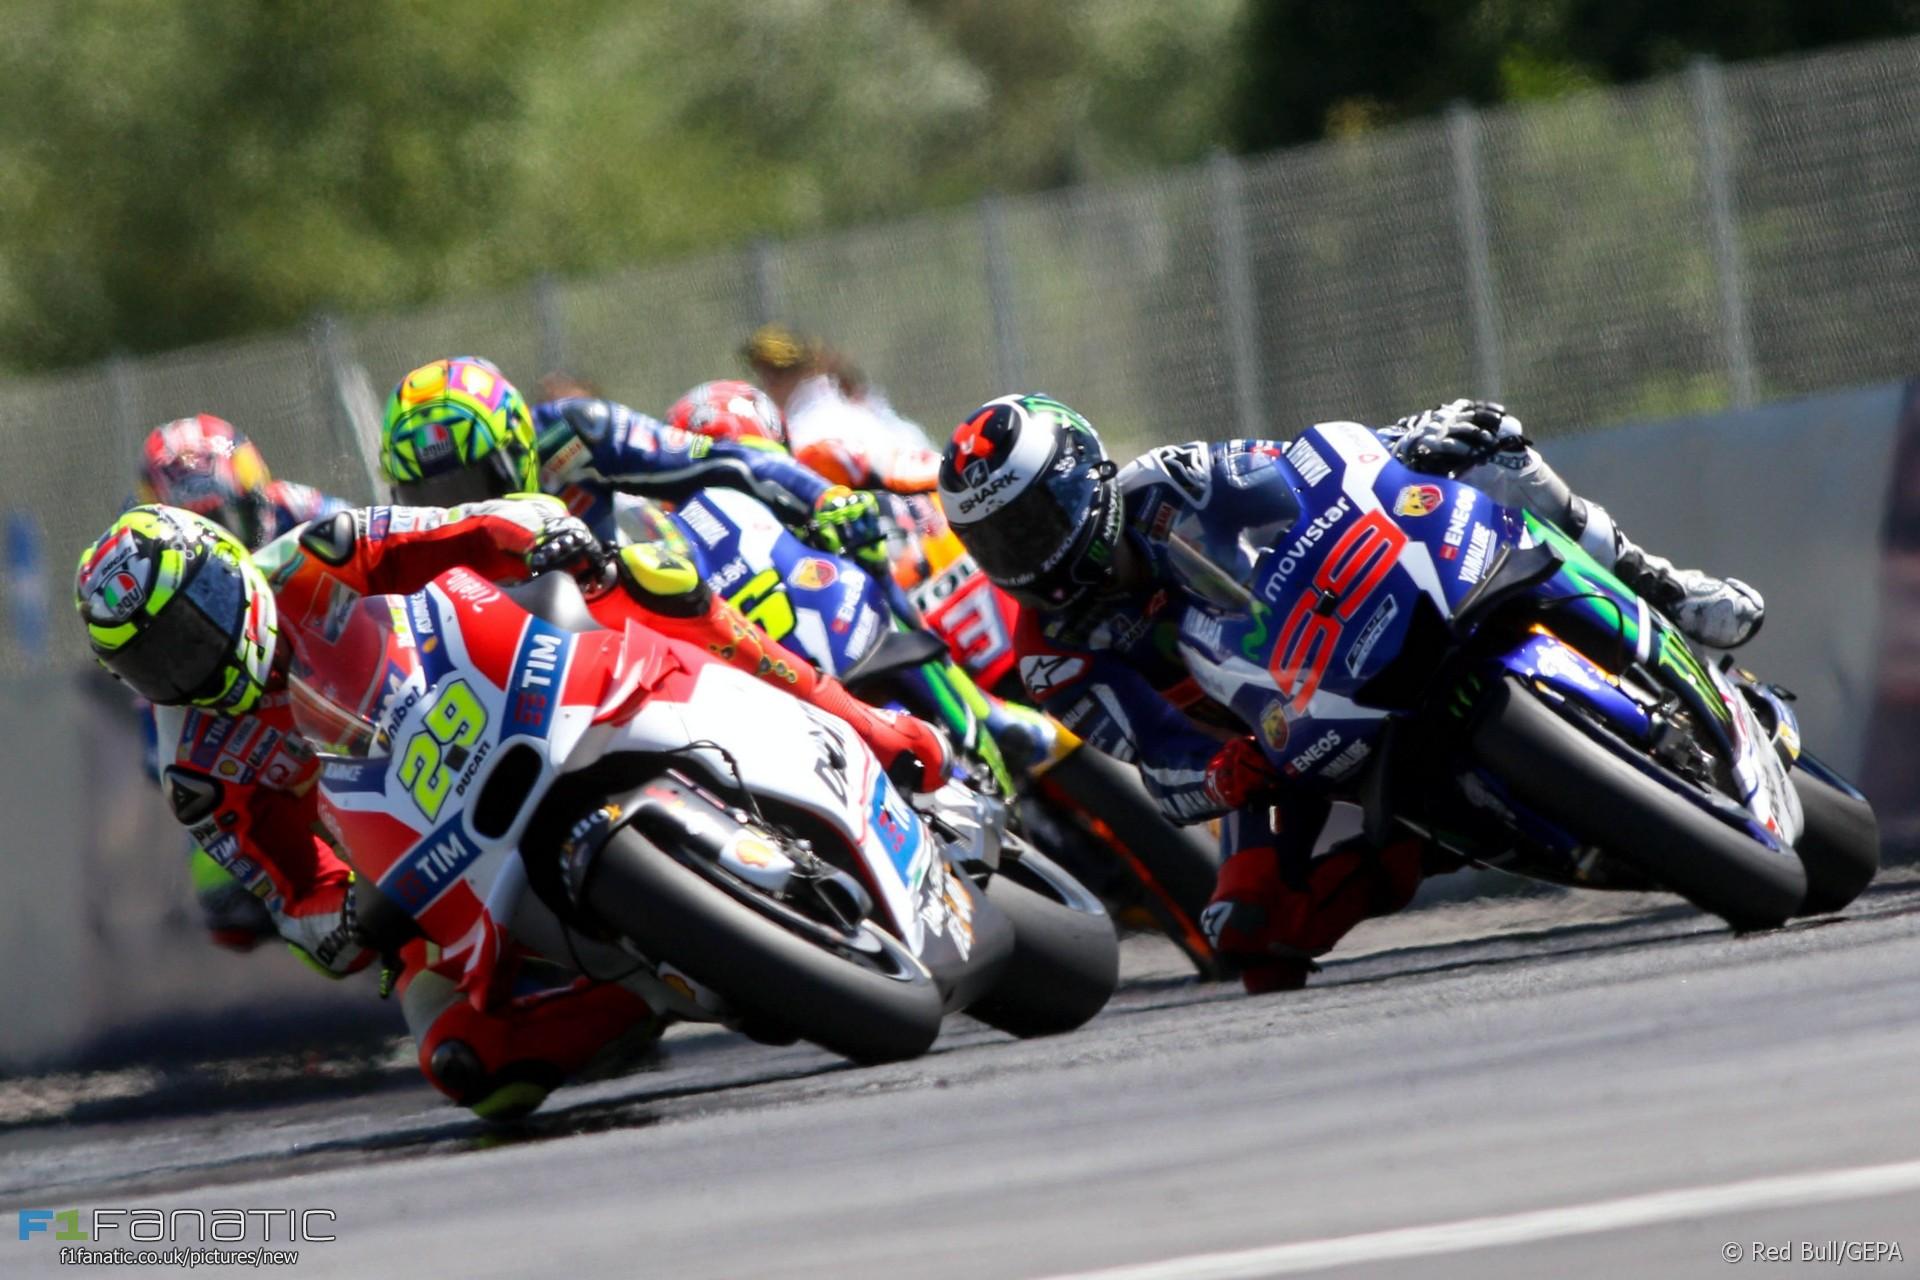 Andrea Iannone, Moto GP, Red Bull Ring, 2016